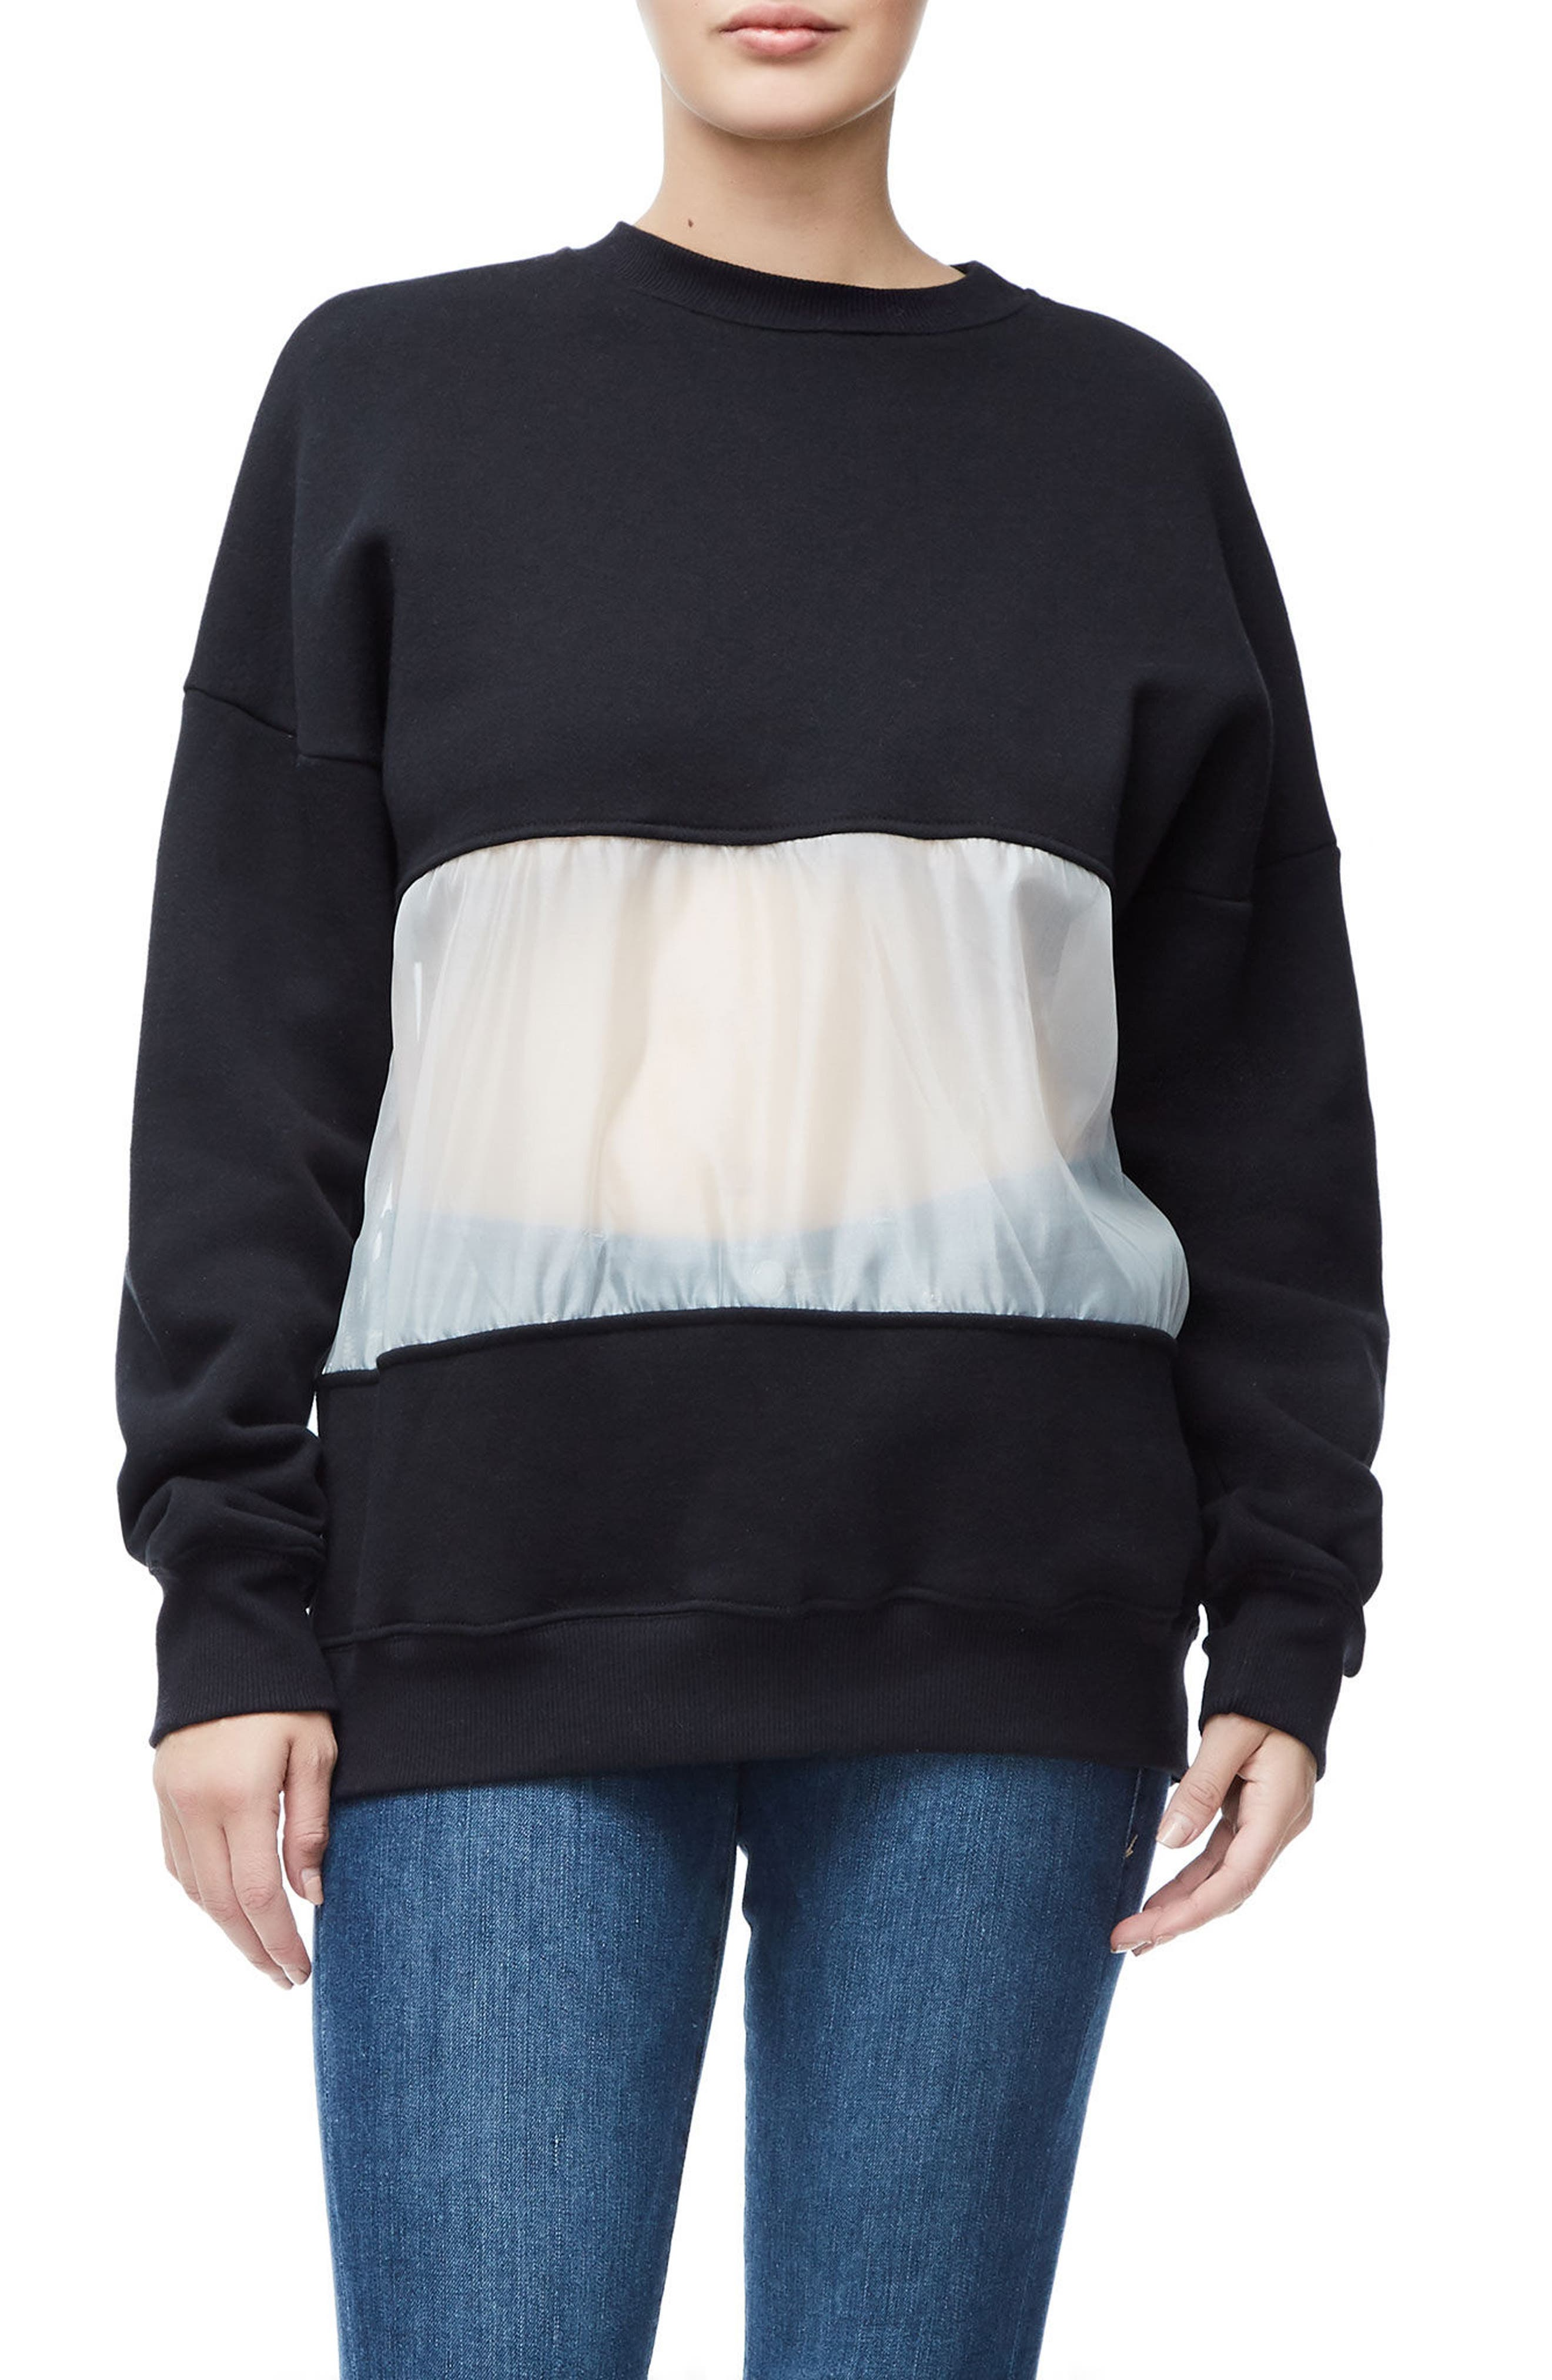 Mixed Media Oversize Sweatshirt,                             Main thumbnail 1, color,                             Black001